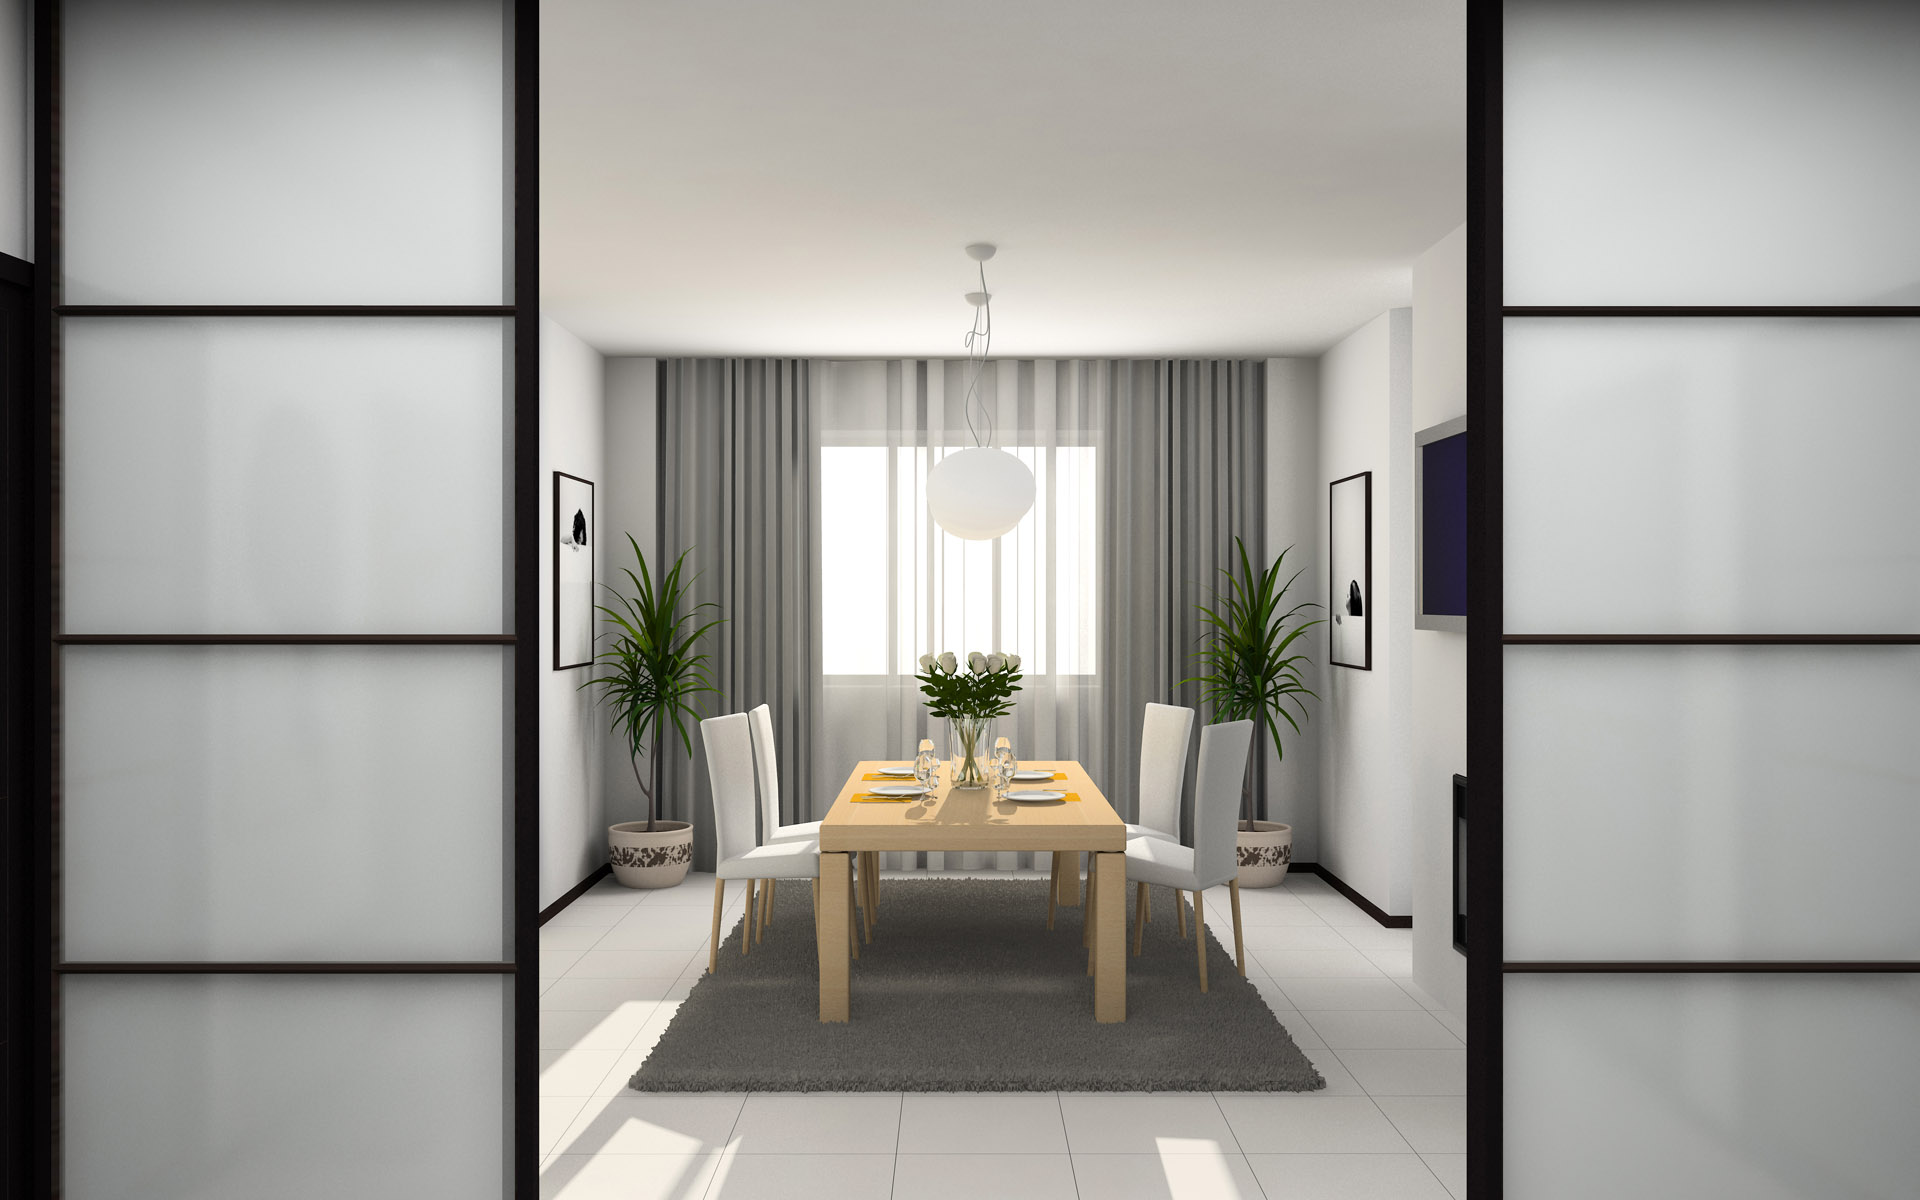 drwaing-room-ideas1 drwaing room ideas